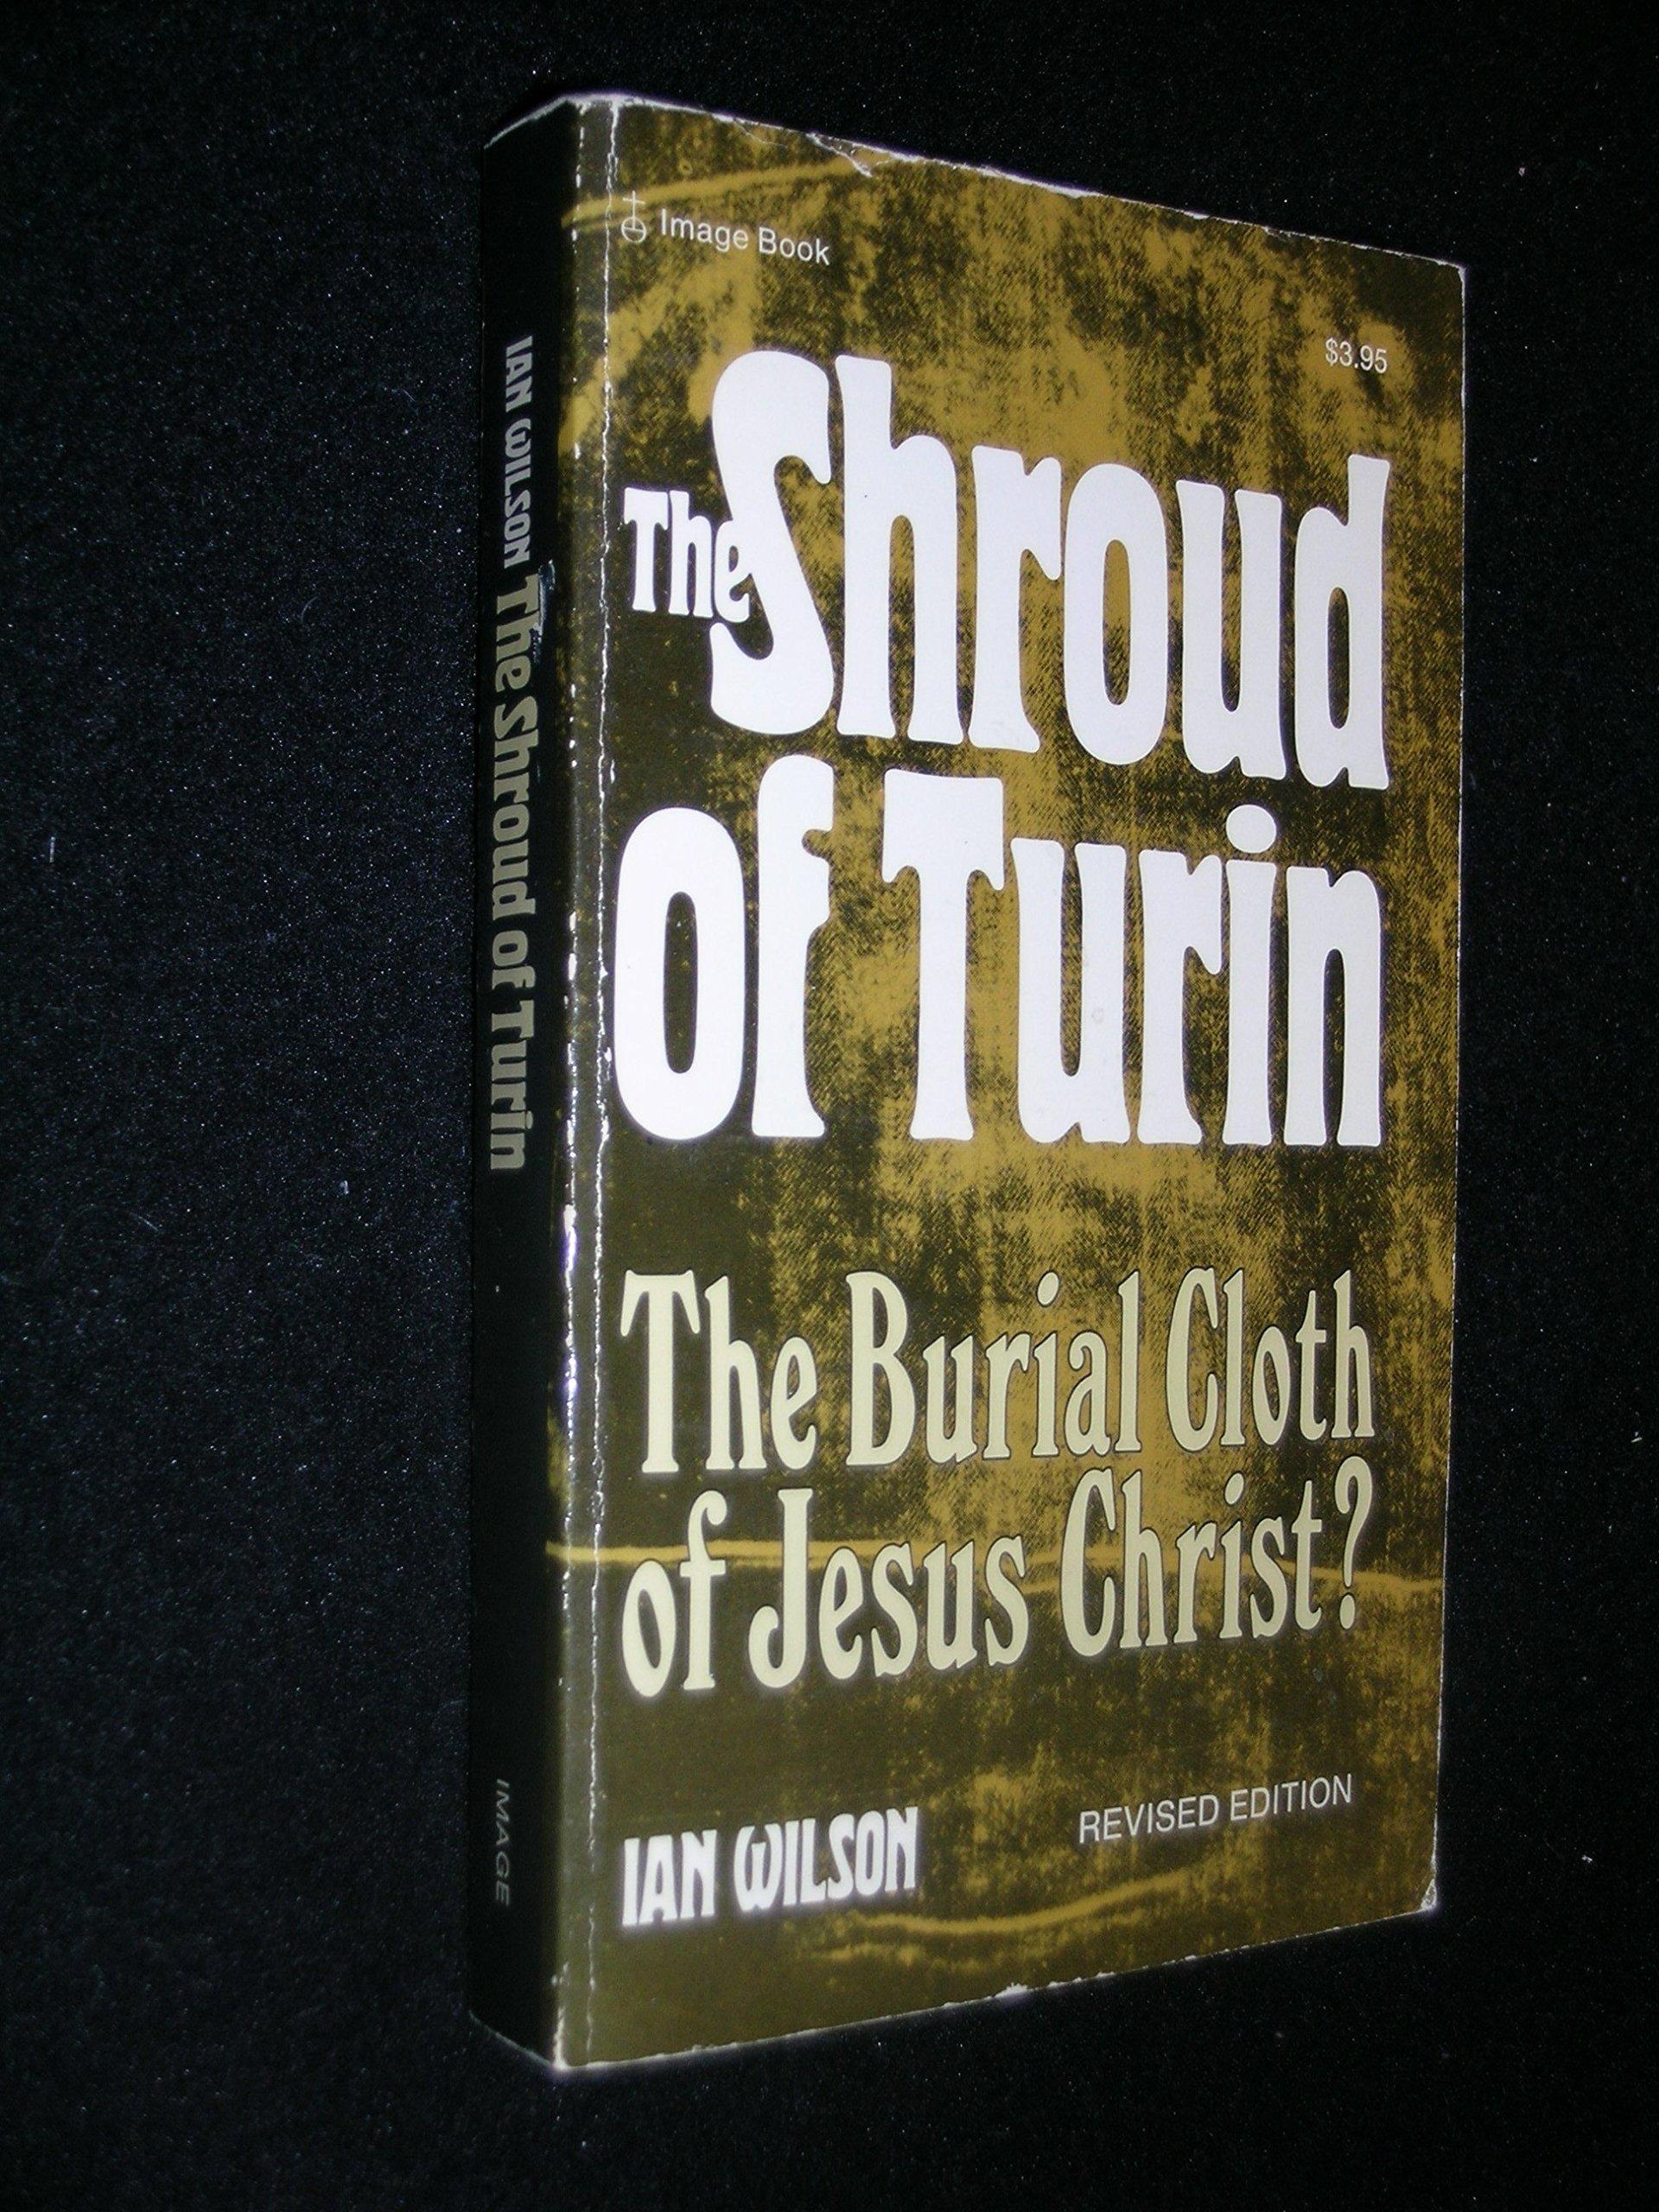 The Shroud of Turin: The Burial Cloth of Jesus Christ?: Ian